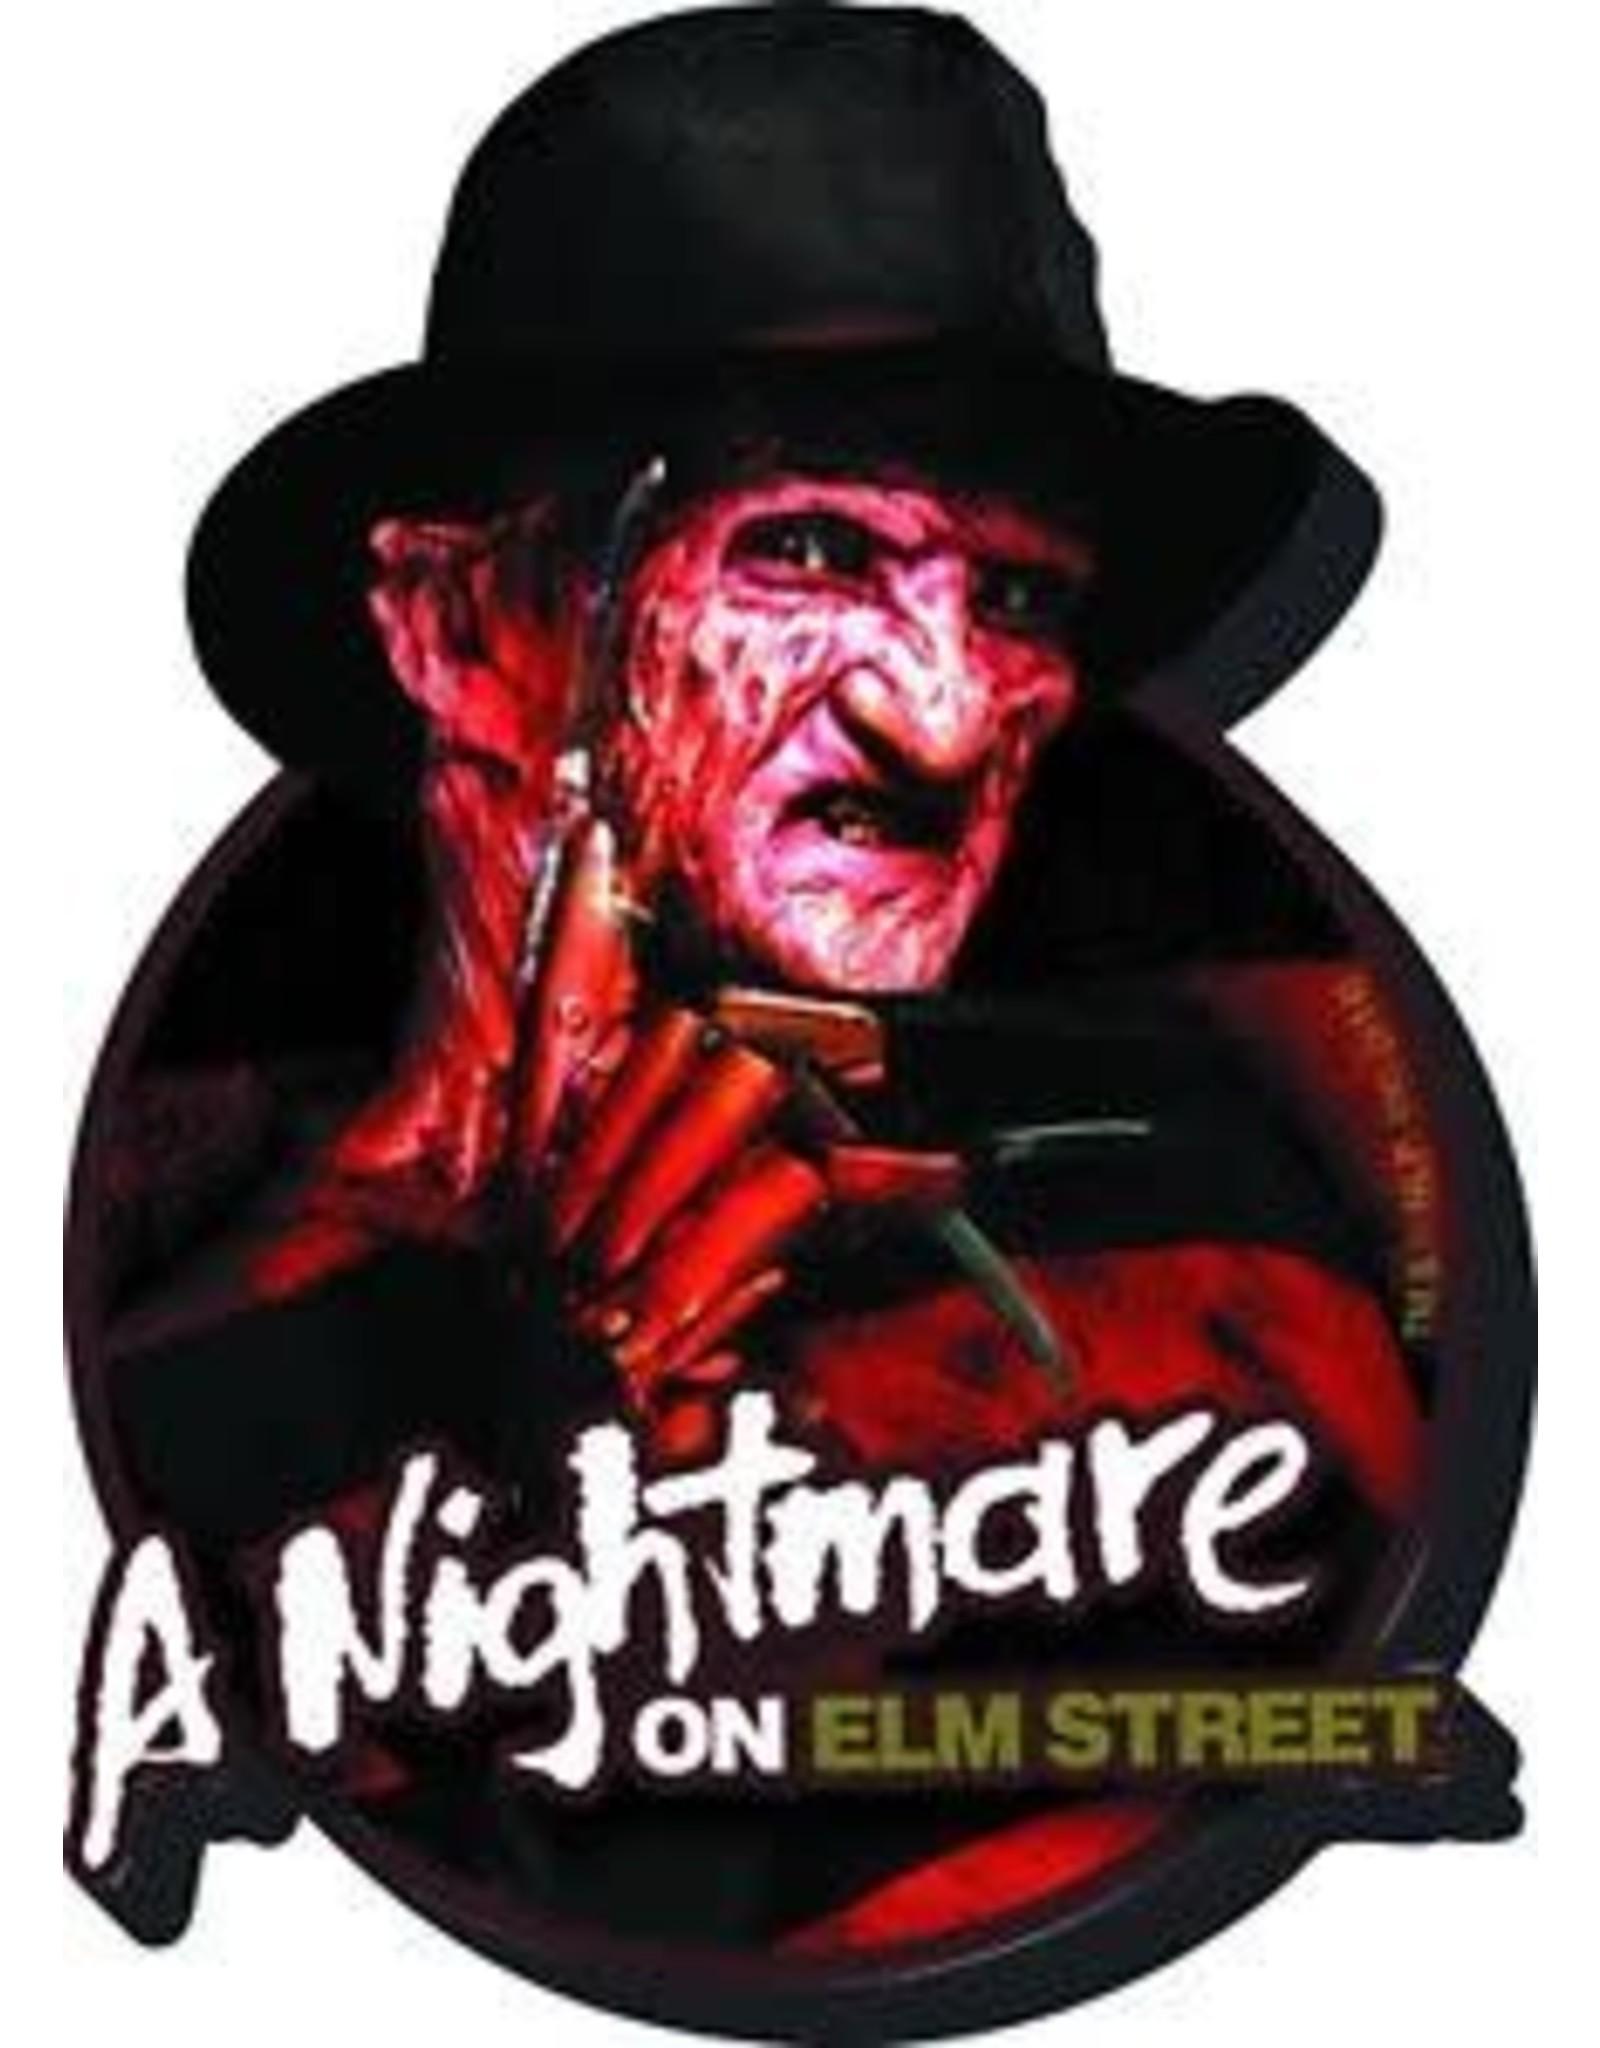 NMR Elm Street Magnet